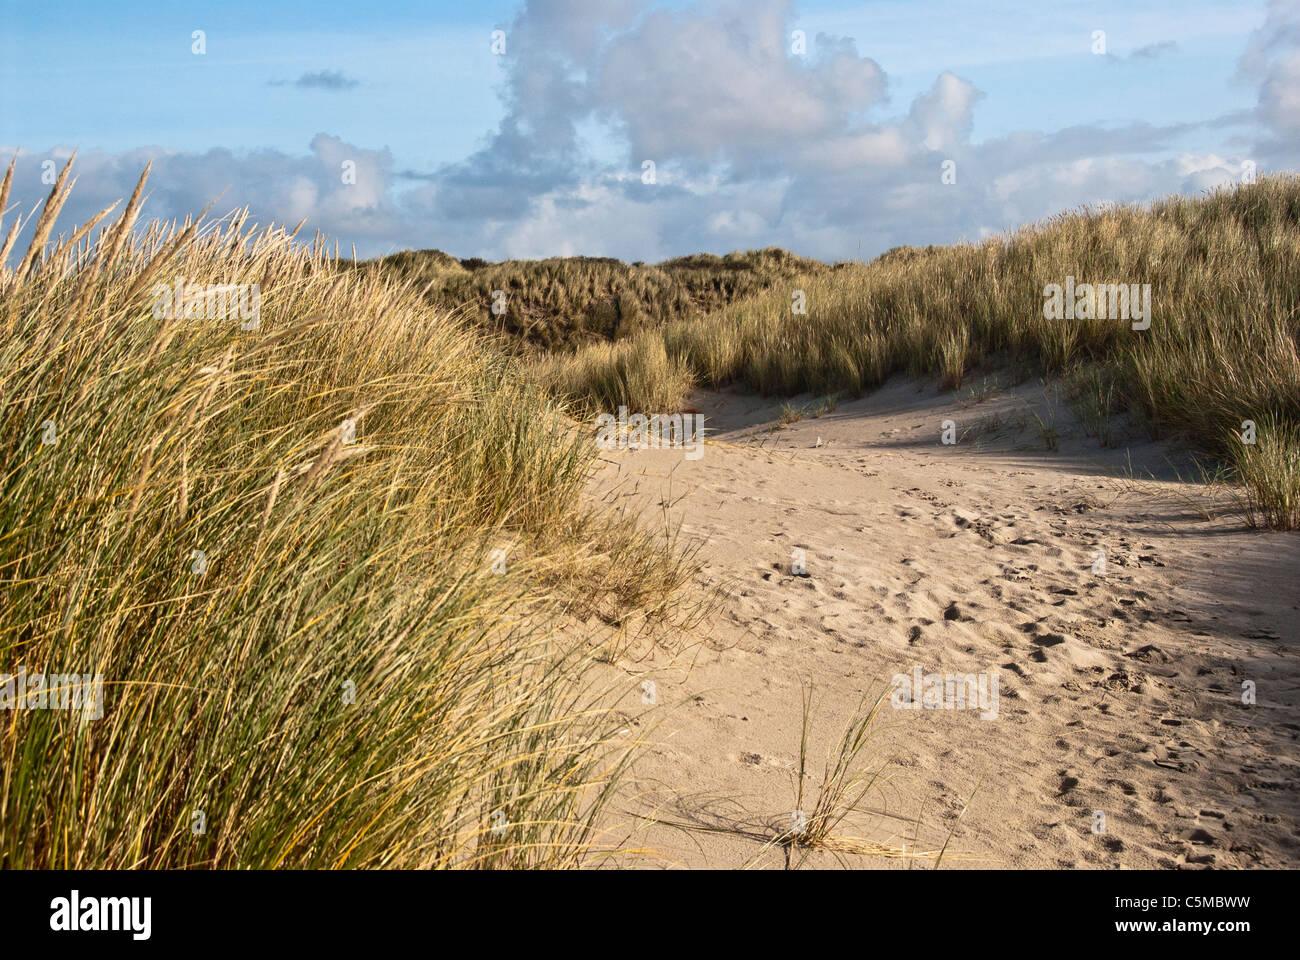 European Marram Grass, Ammophila arenaria, on a dune near the North Sea beach at Vejers beach in Jutland, Denmark - Stock Image